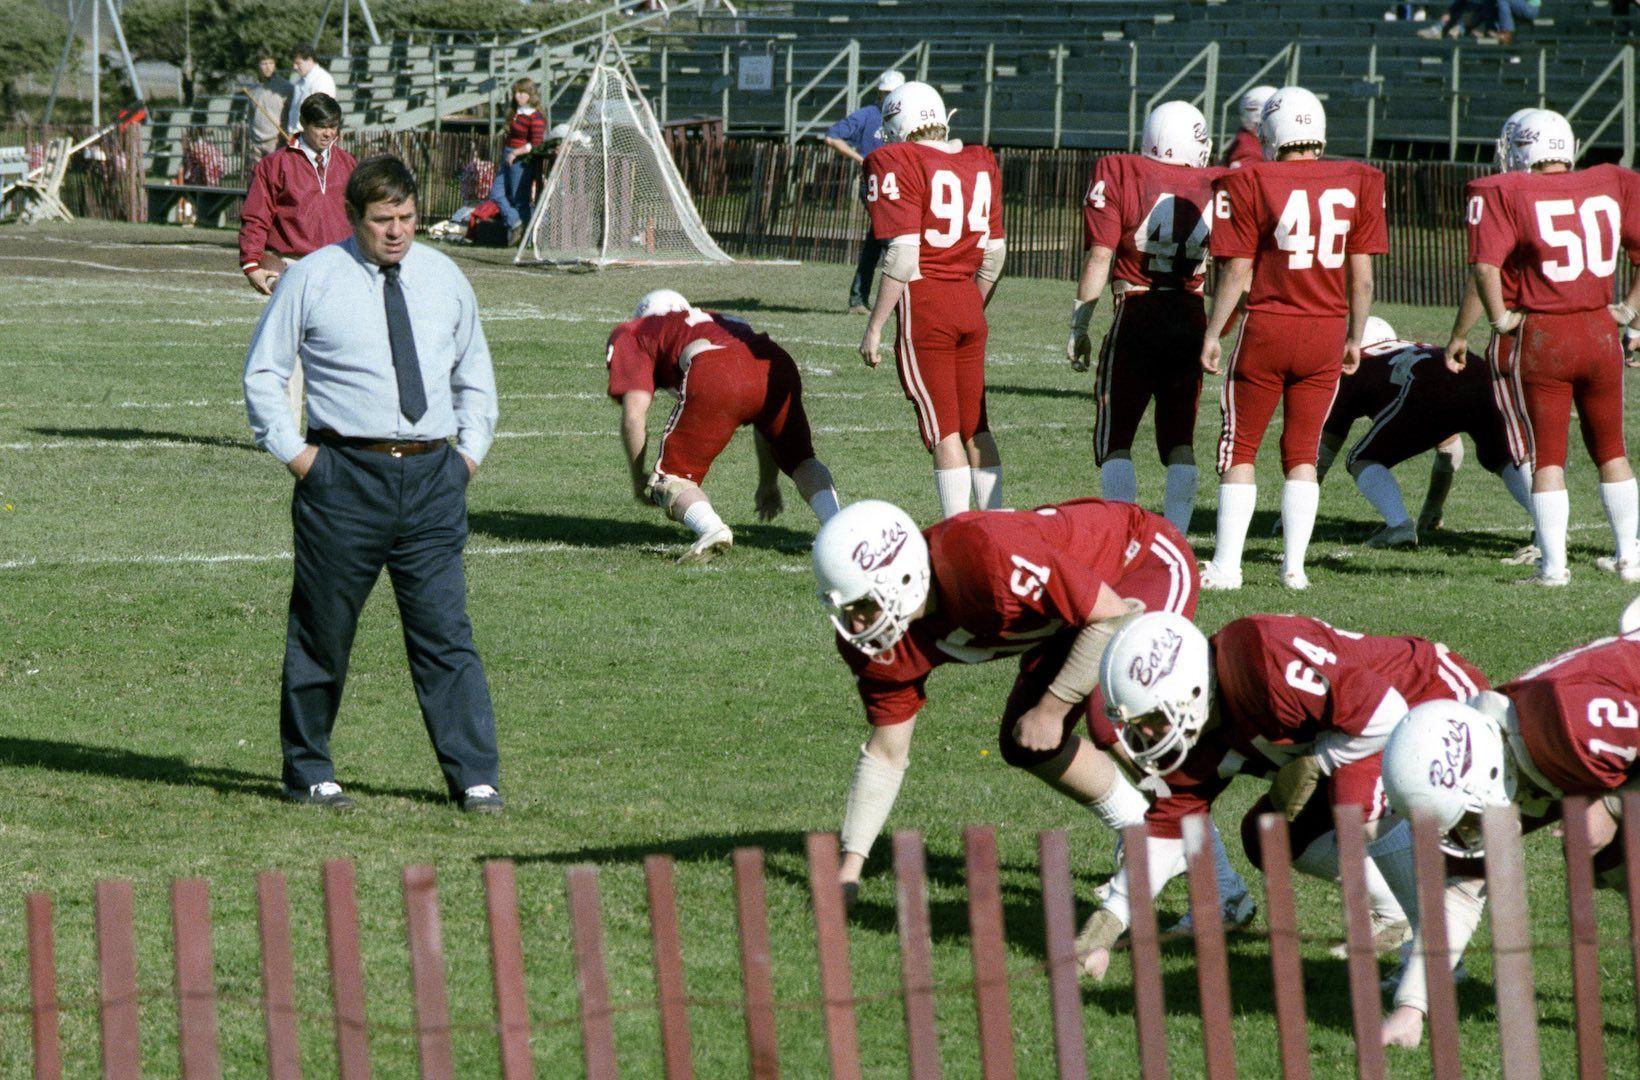 Bob Flynn watches the Bobcat linemen go through warmups in 1981. (Steve Fuller '82 photograph)